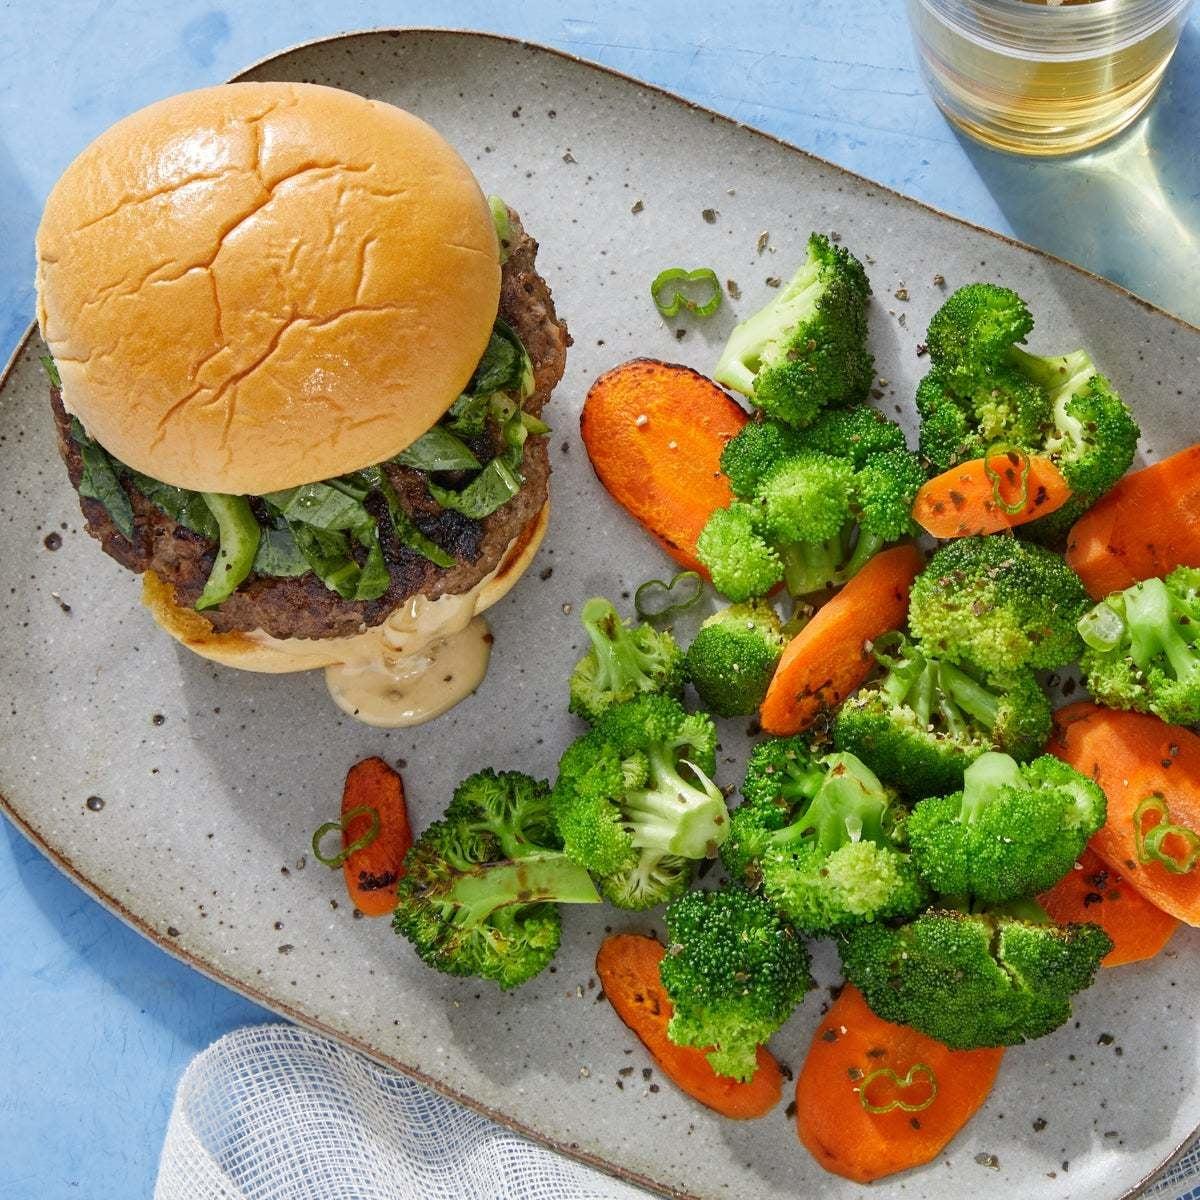 Asian-Style Beef & Shiitake Burgers with Sautéed Broccoli & Carrots